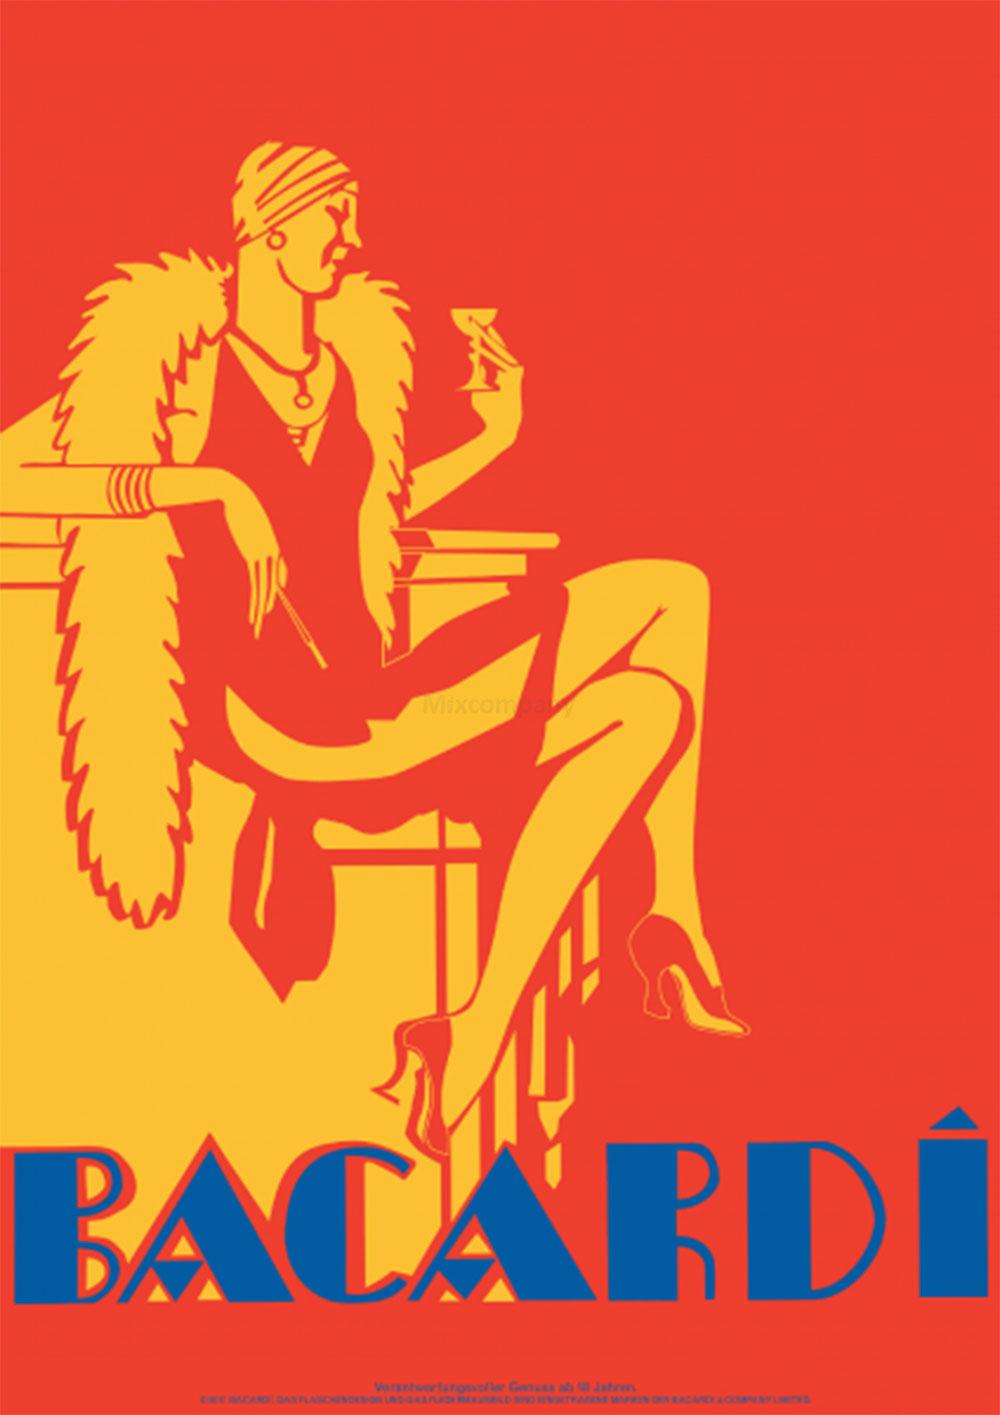 Bacardi Schuber Geschenkset - Bacardi Oakheart Spiced Rum 0,7l 700ml (35% Vol) + 2x Becher + 2x Coca Cola je 0,2L - Inkl. Pfand MEHRWEG